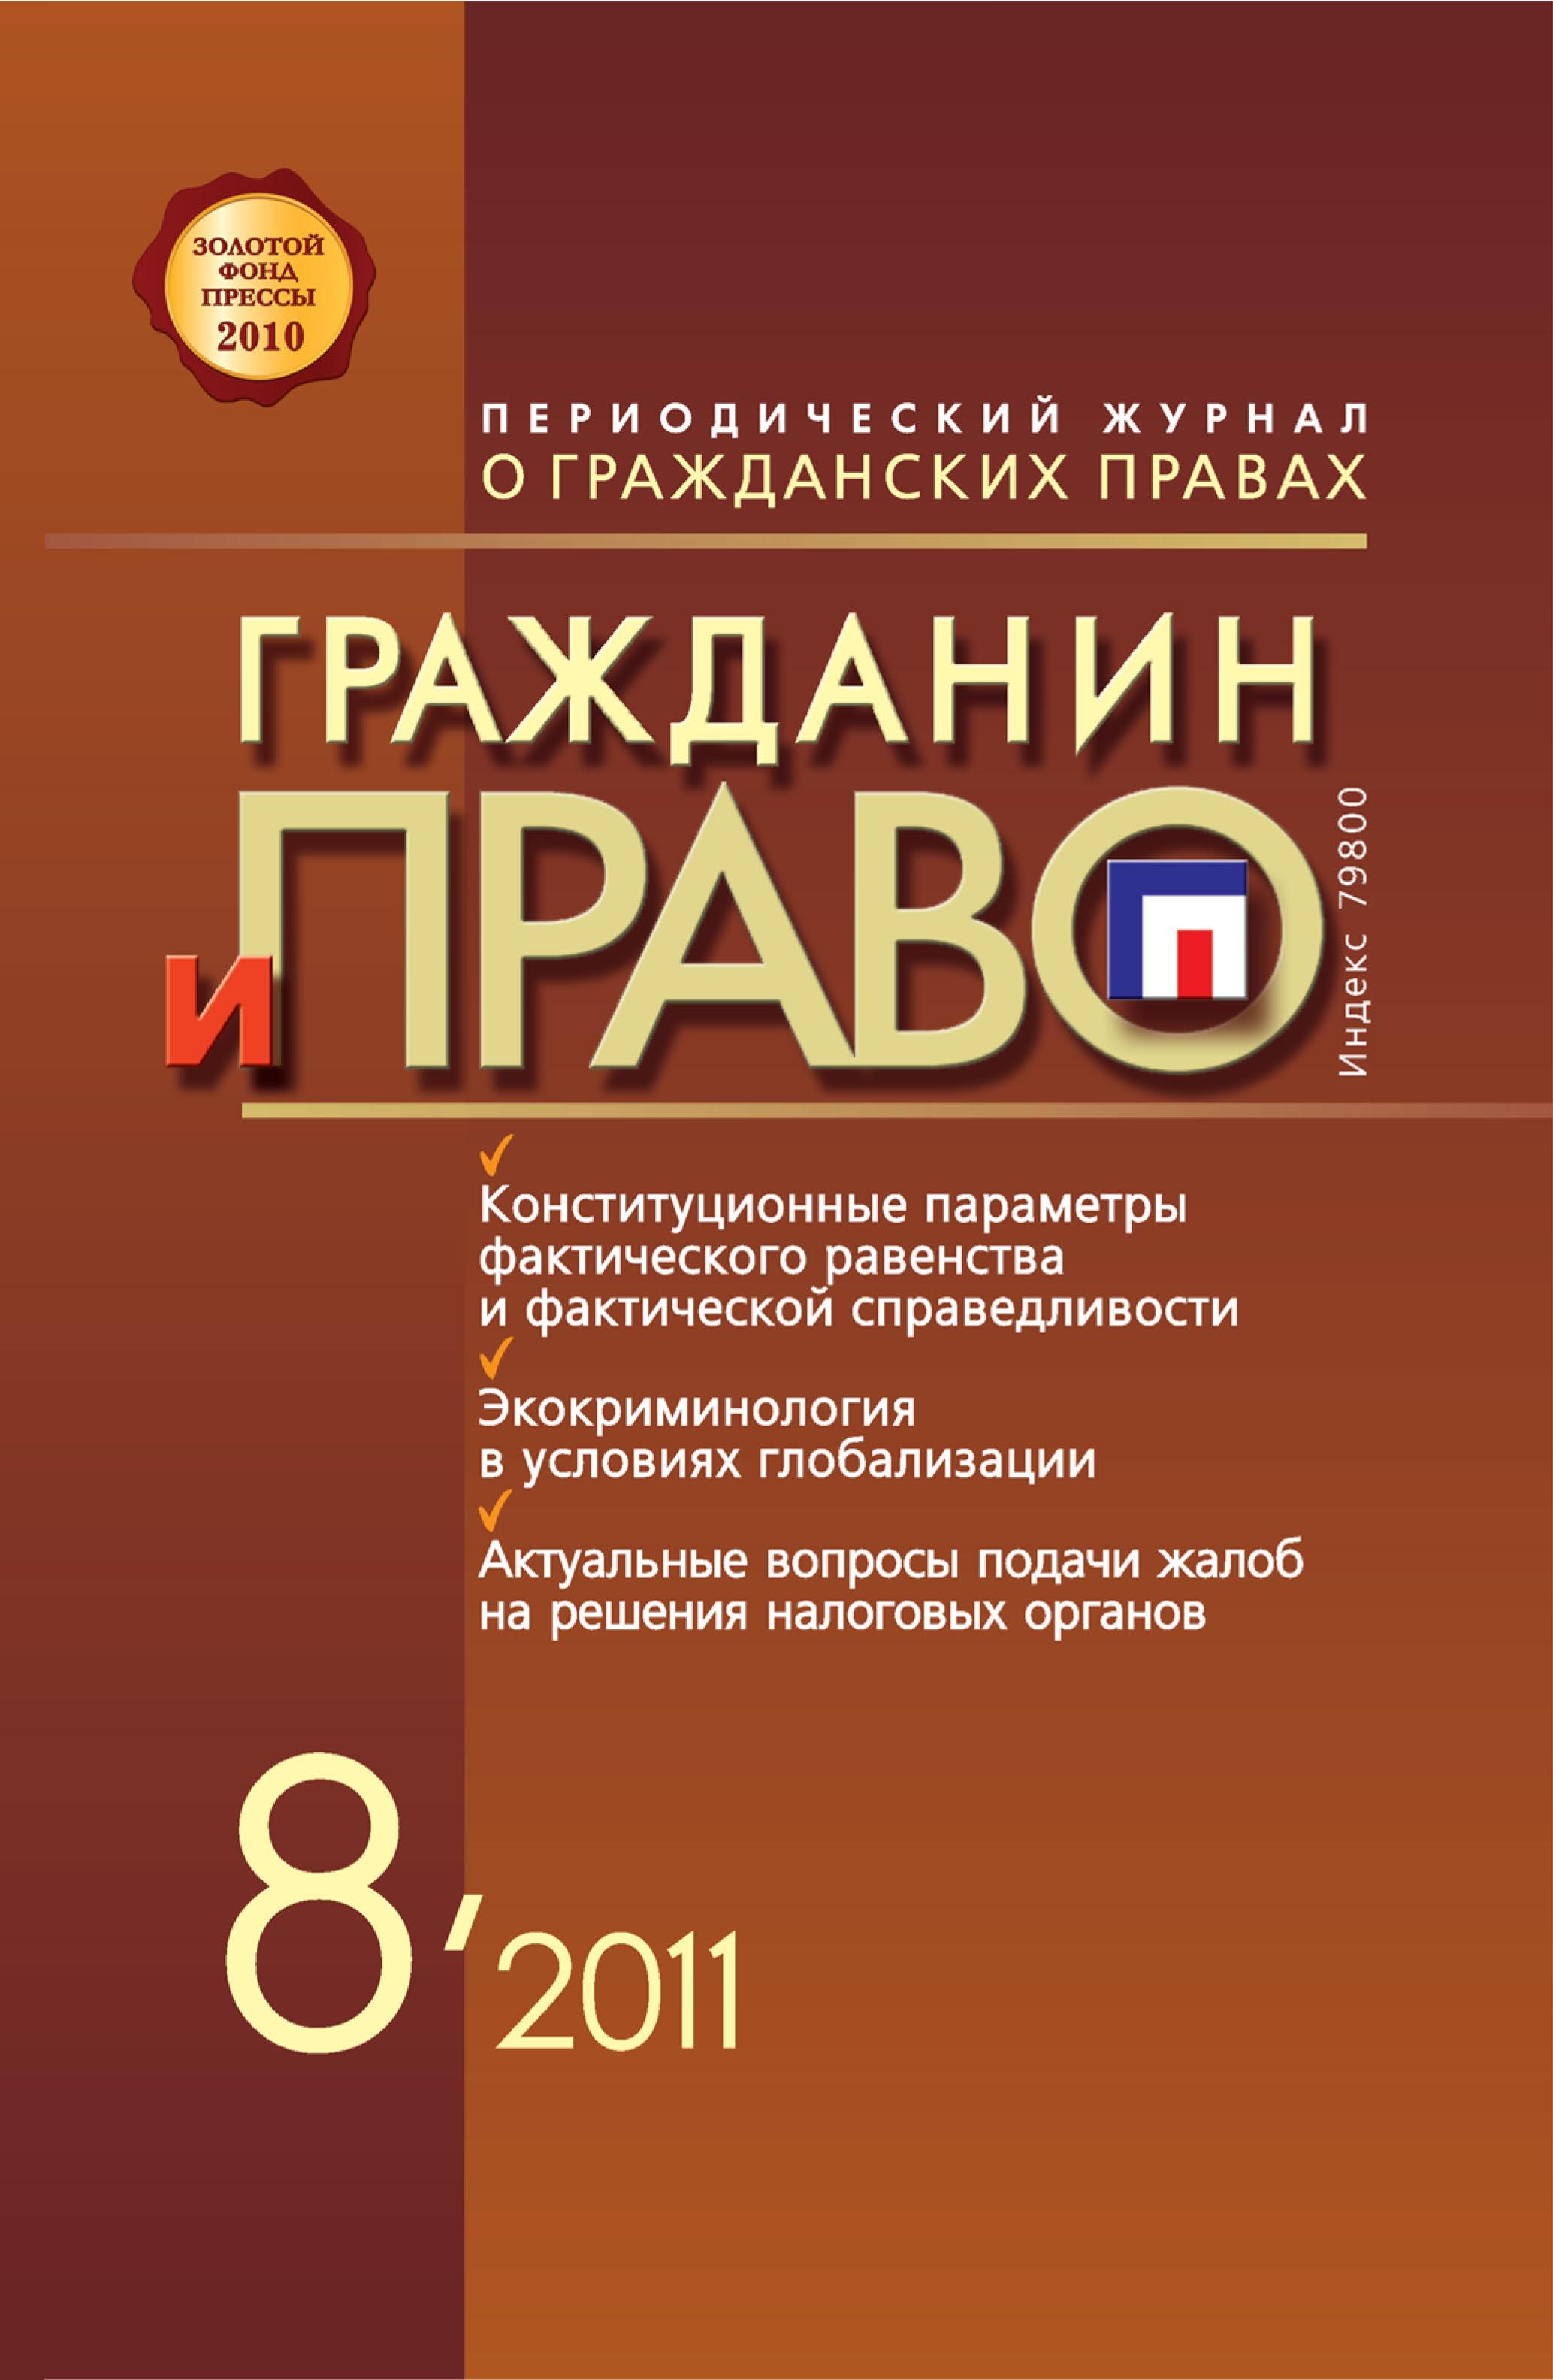 Гражданин и право №08/2011